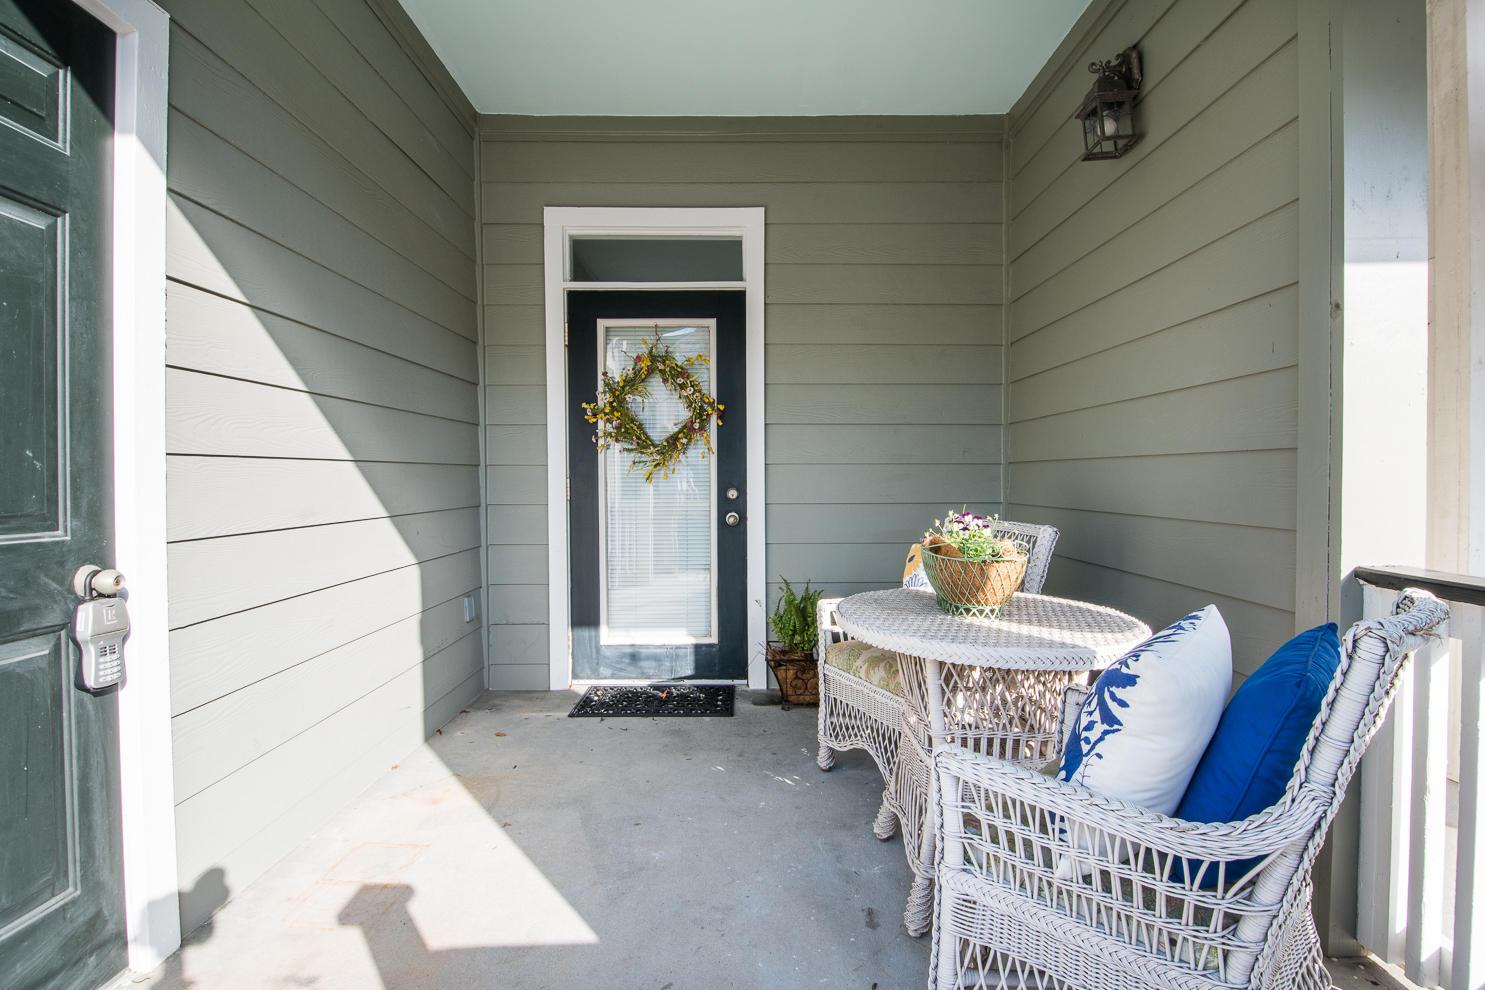 Daniel Landing Condos Homes For Sale - 130 River Landing, Charleston, SC - 31